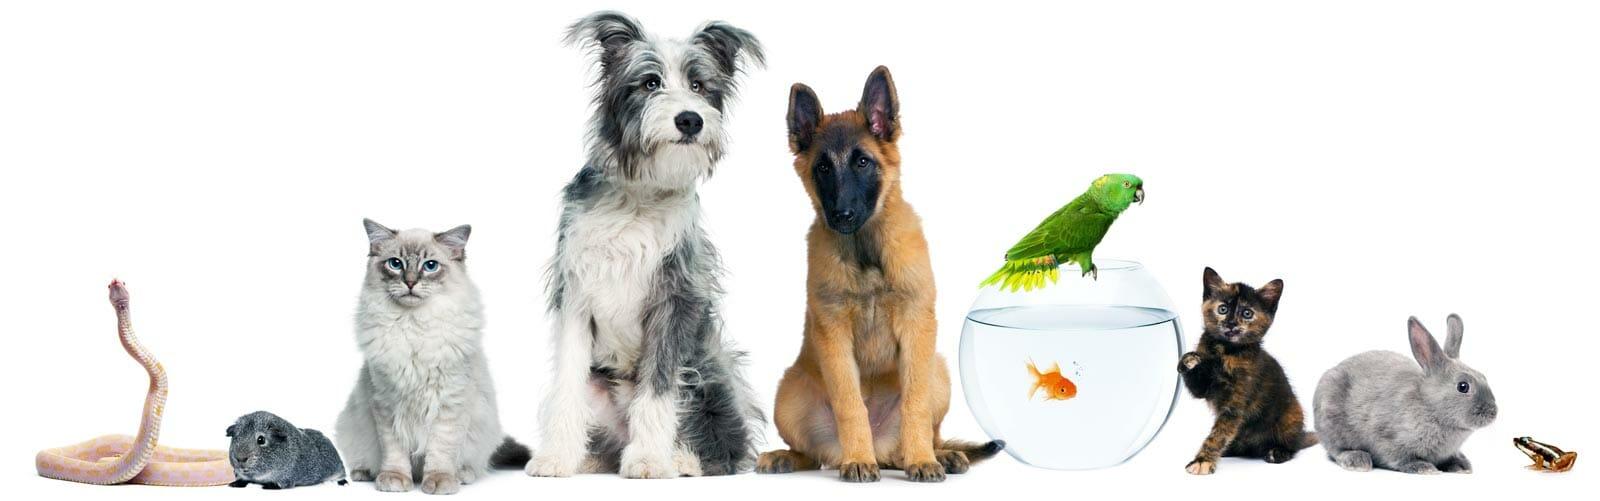 pet supplies dogs cats birds fish